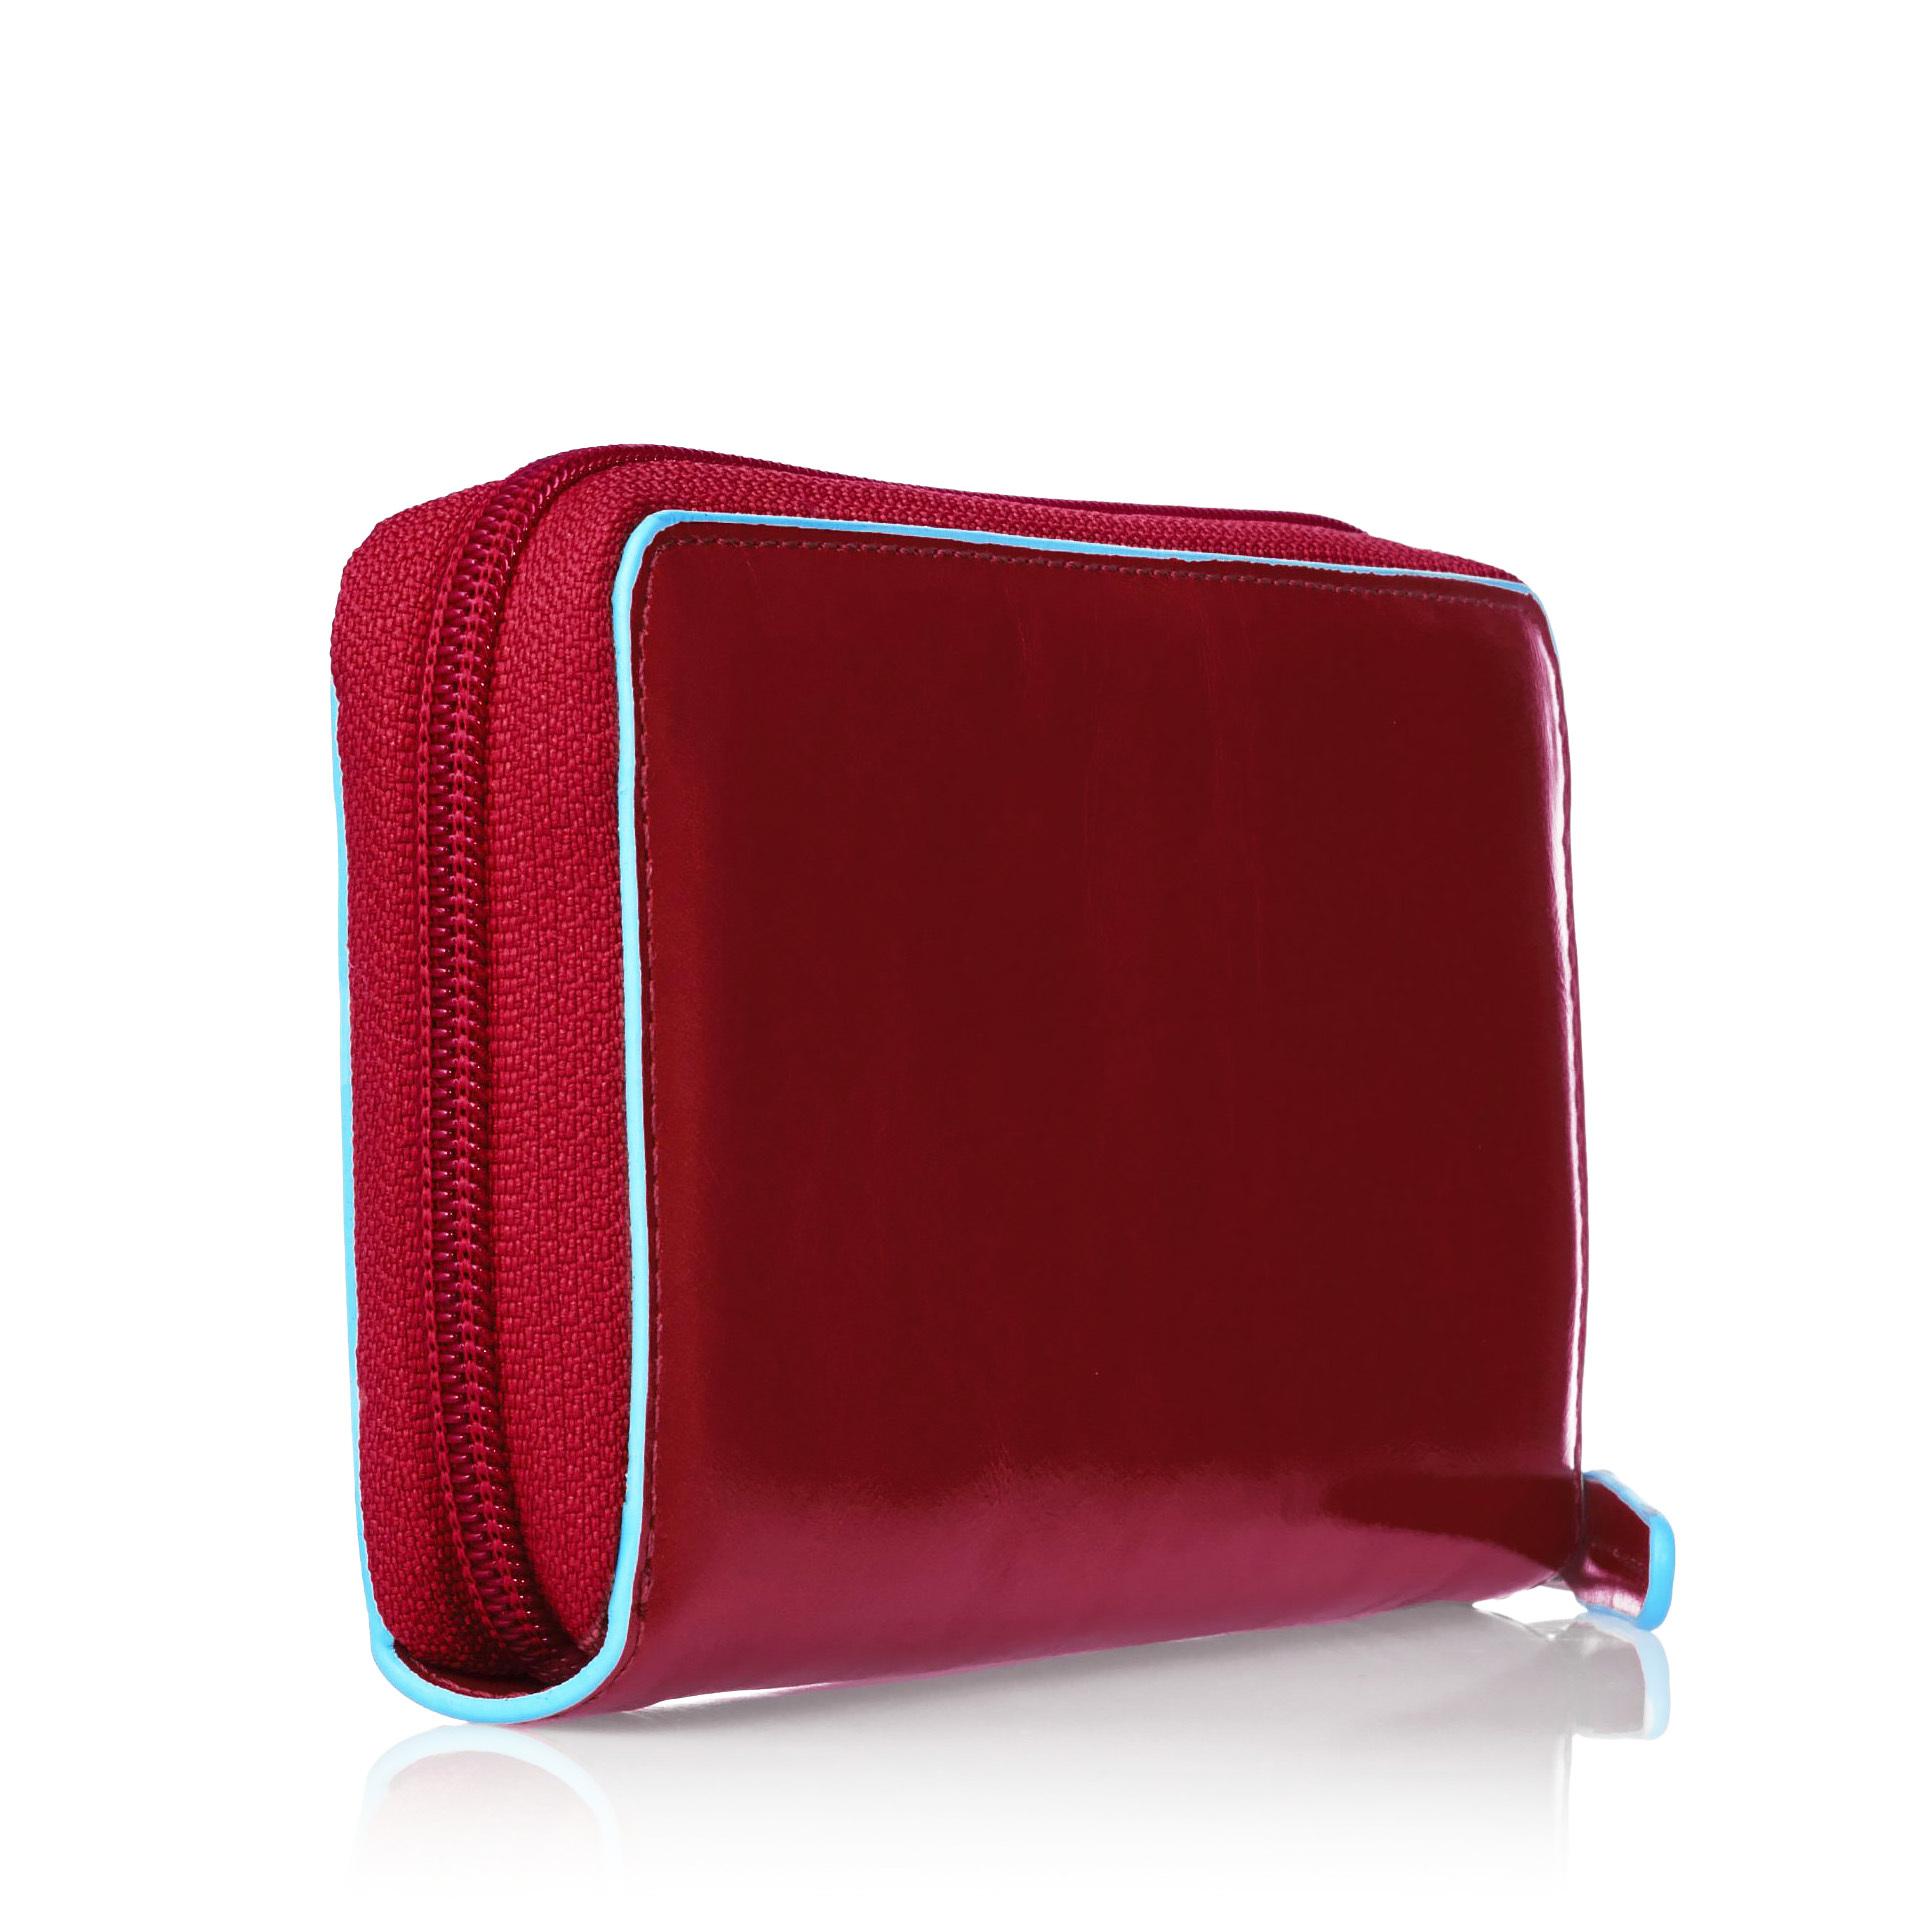 Портмоне Piquadro Blue Square, цвет красный, 18x9,5x2,5 см (PD3229B2/R)